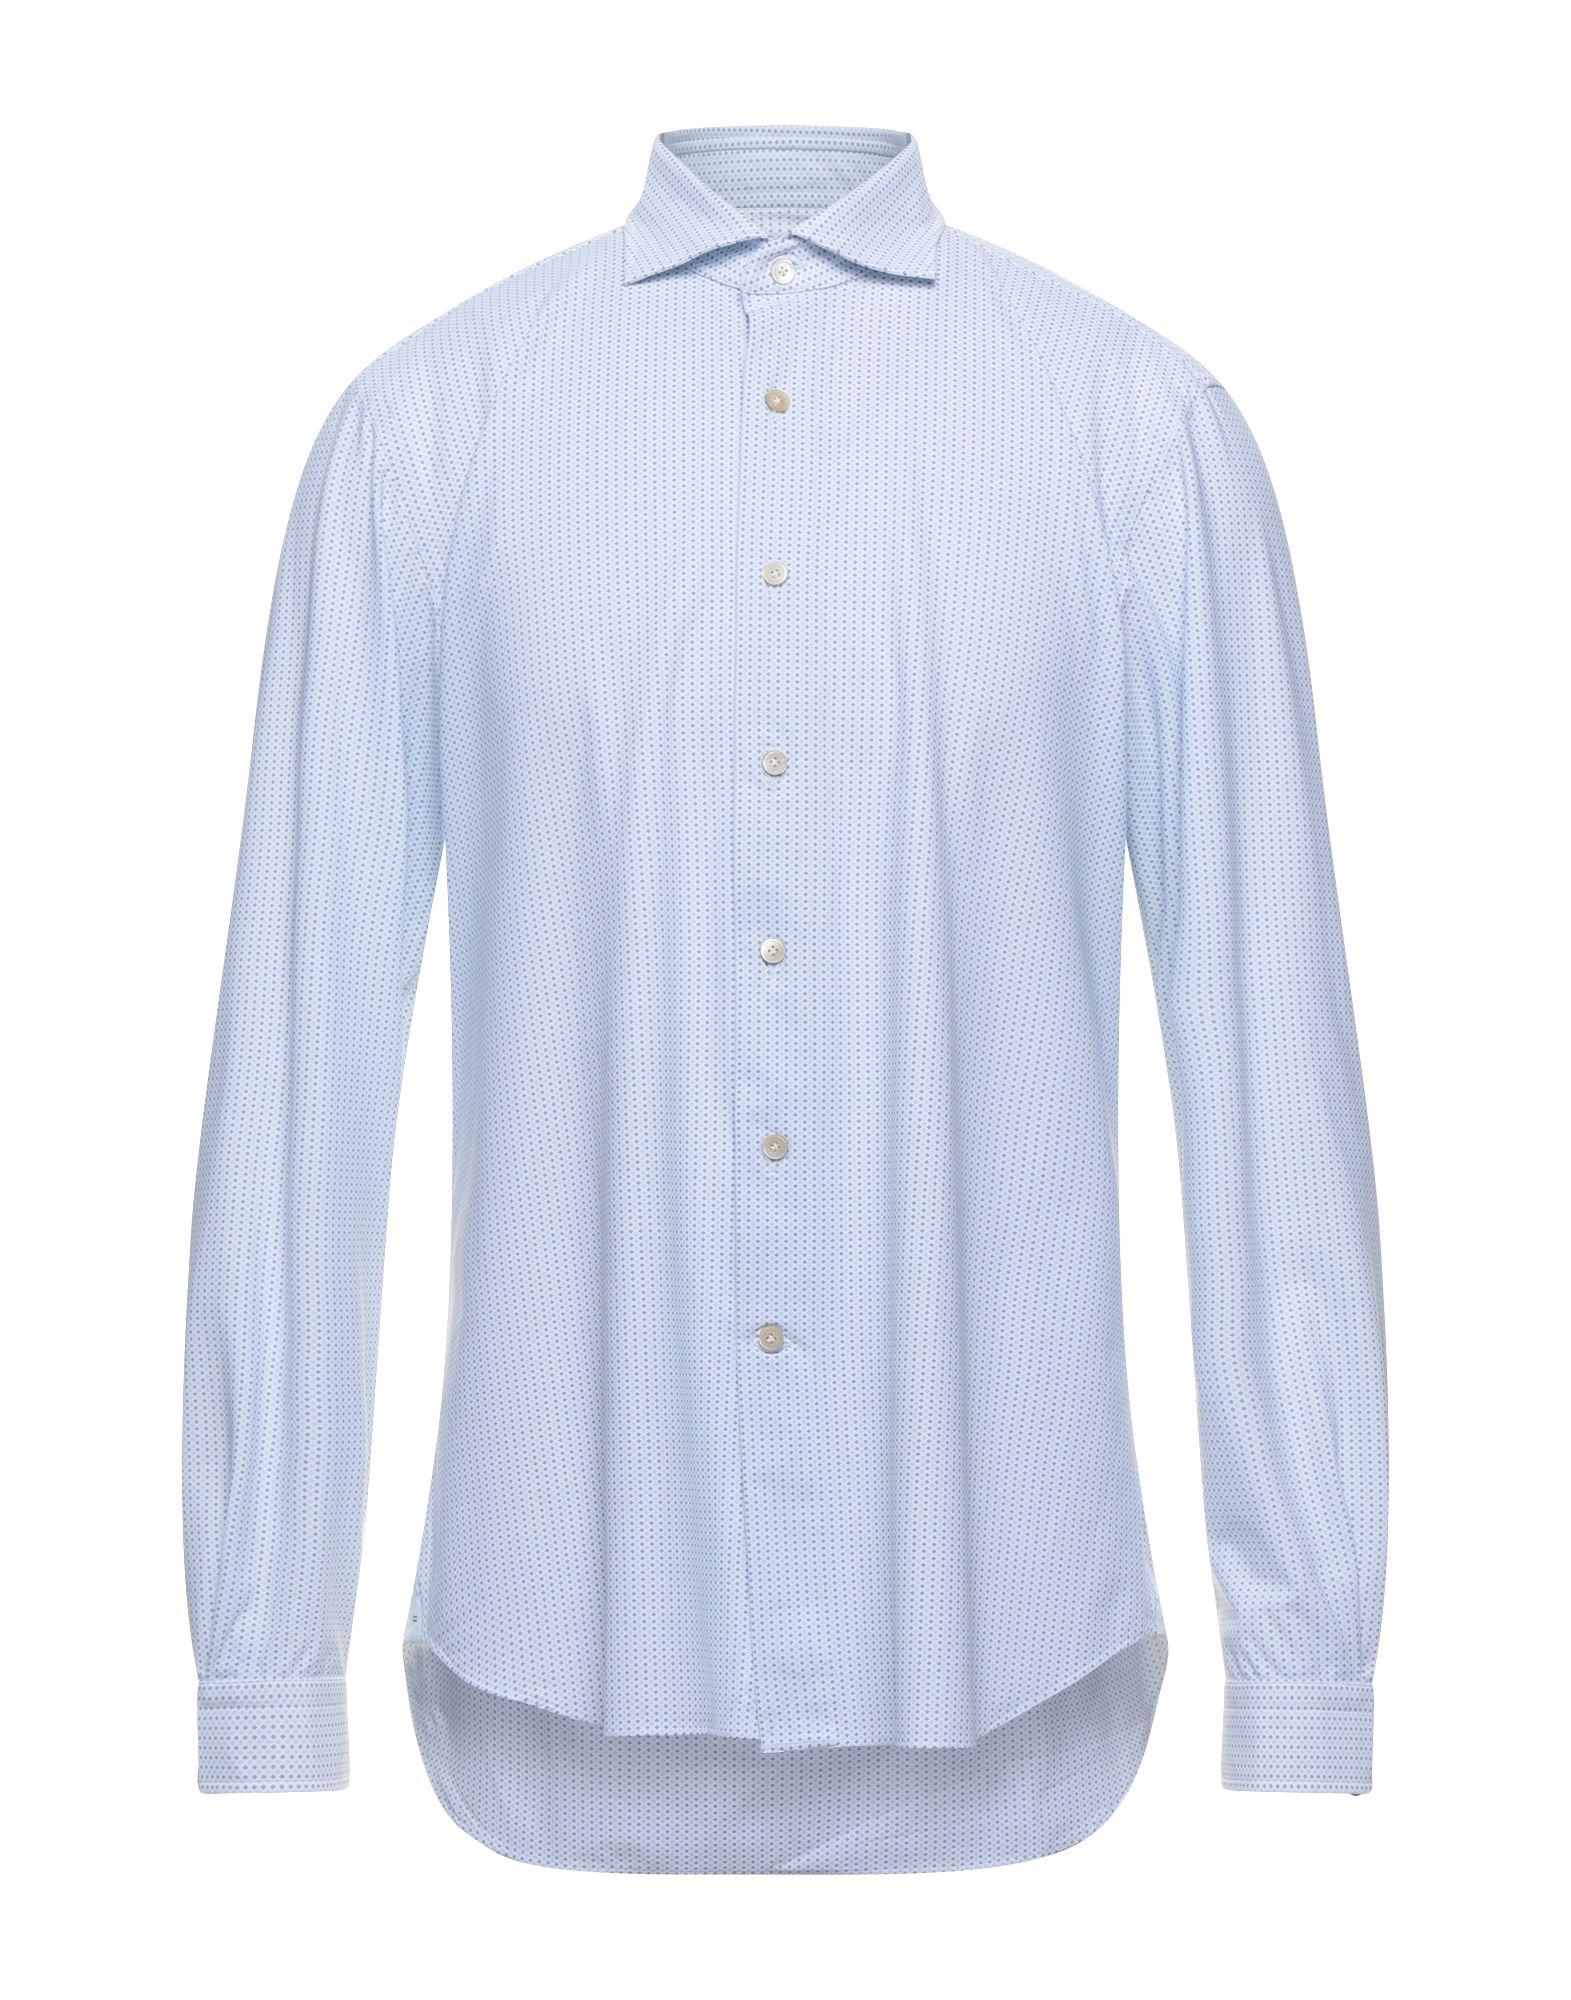 Alessandro Gherardi Shirts In Sky Blue